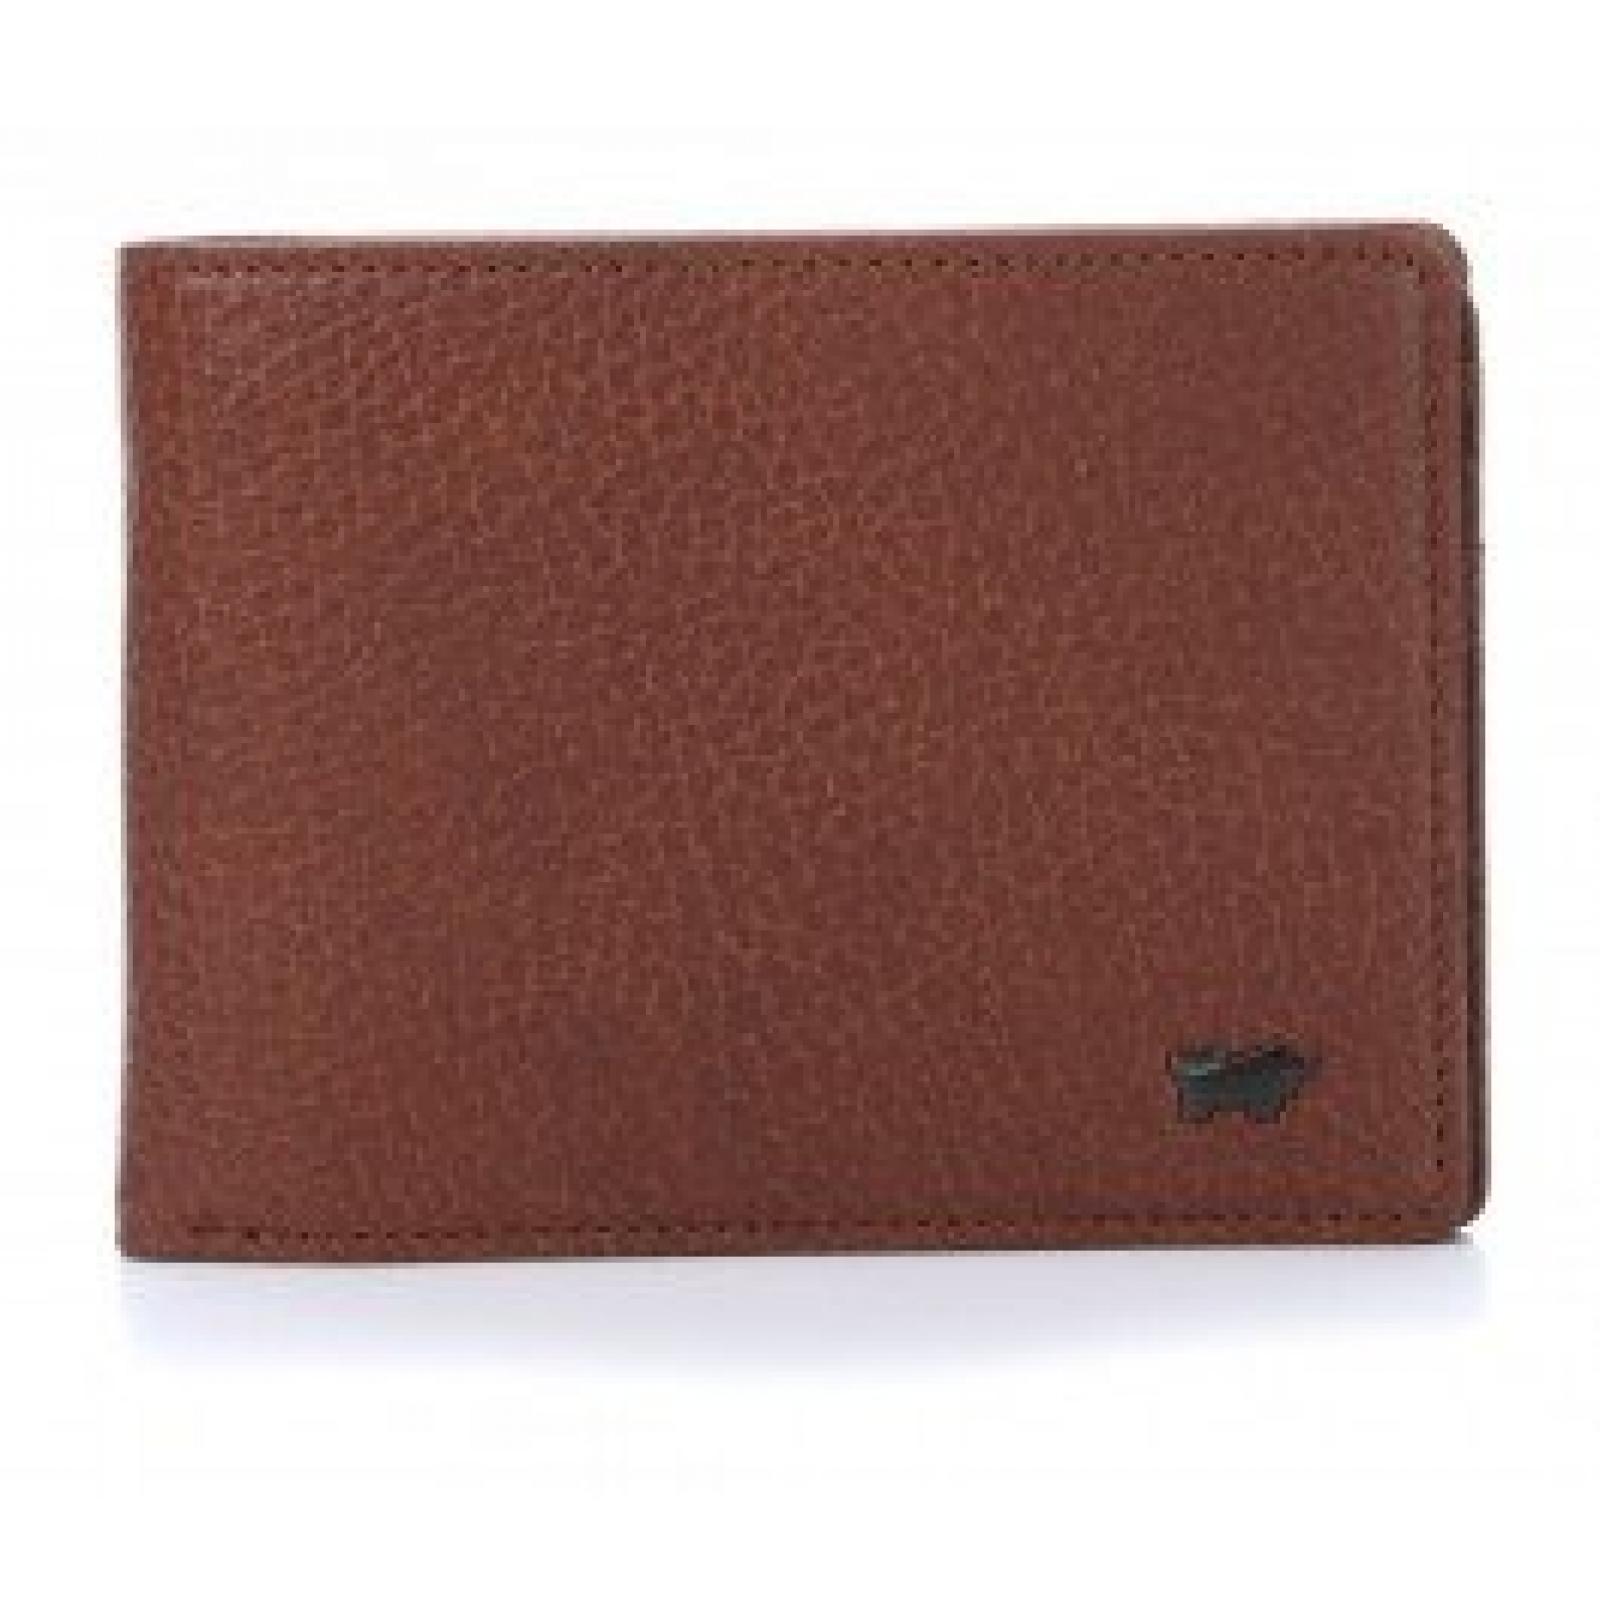 Braun Büffel Dallas Geldbörse Herren 18632-180-020